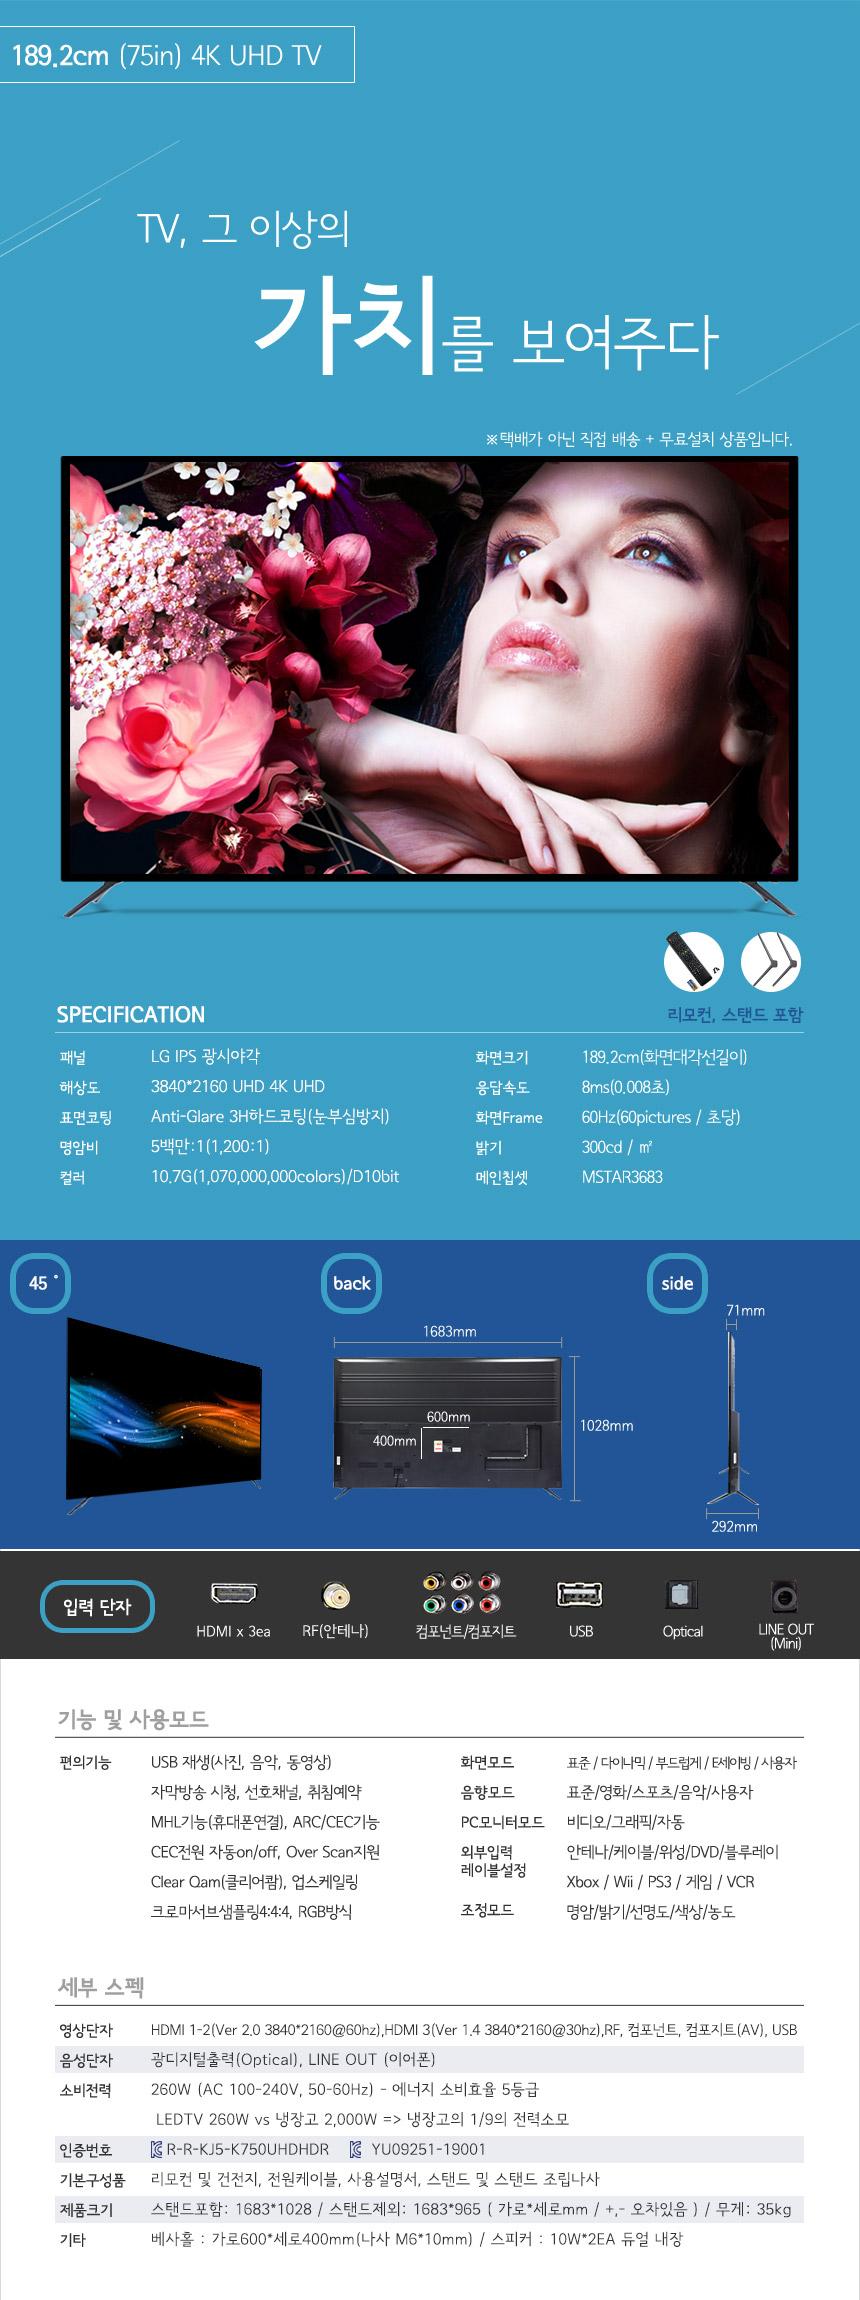 FT750SUHDHDR_01.jpg